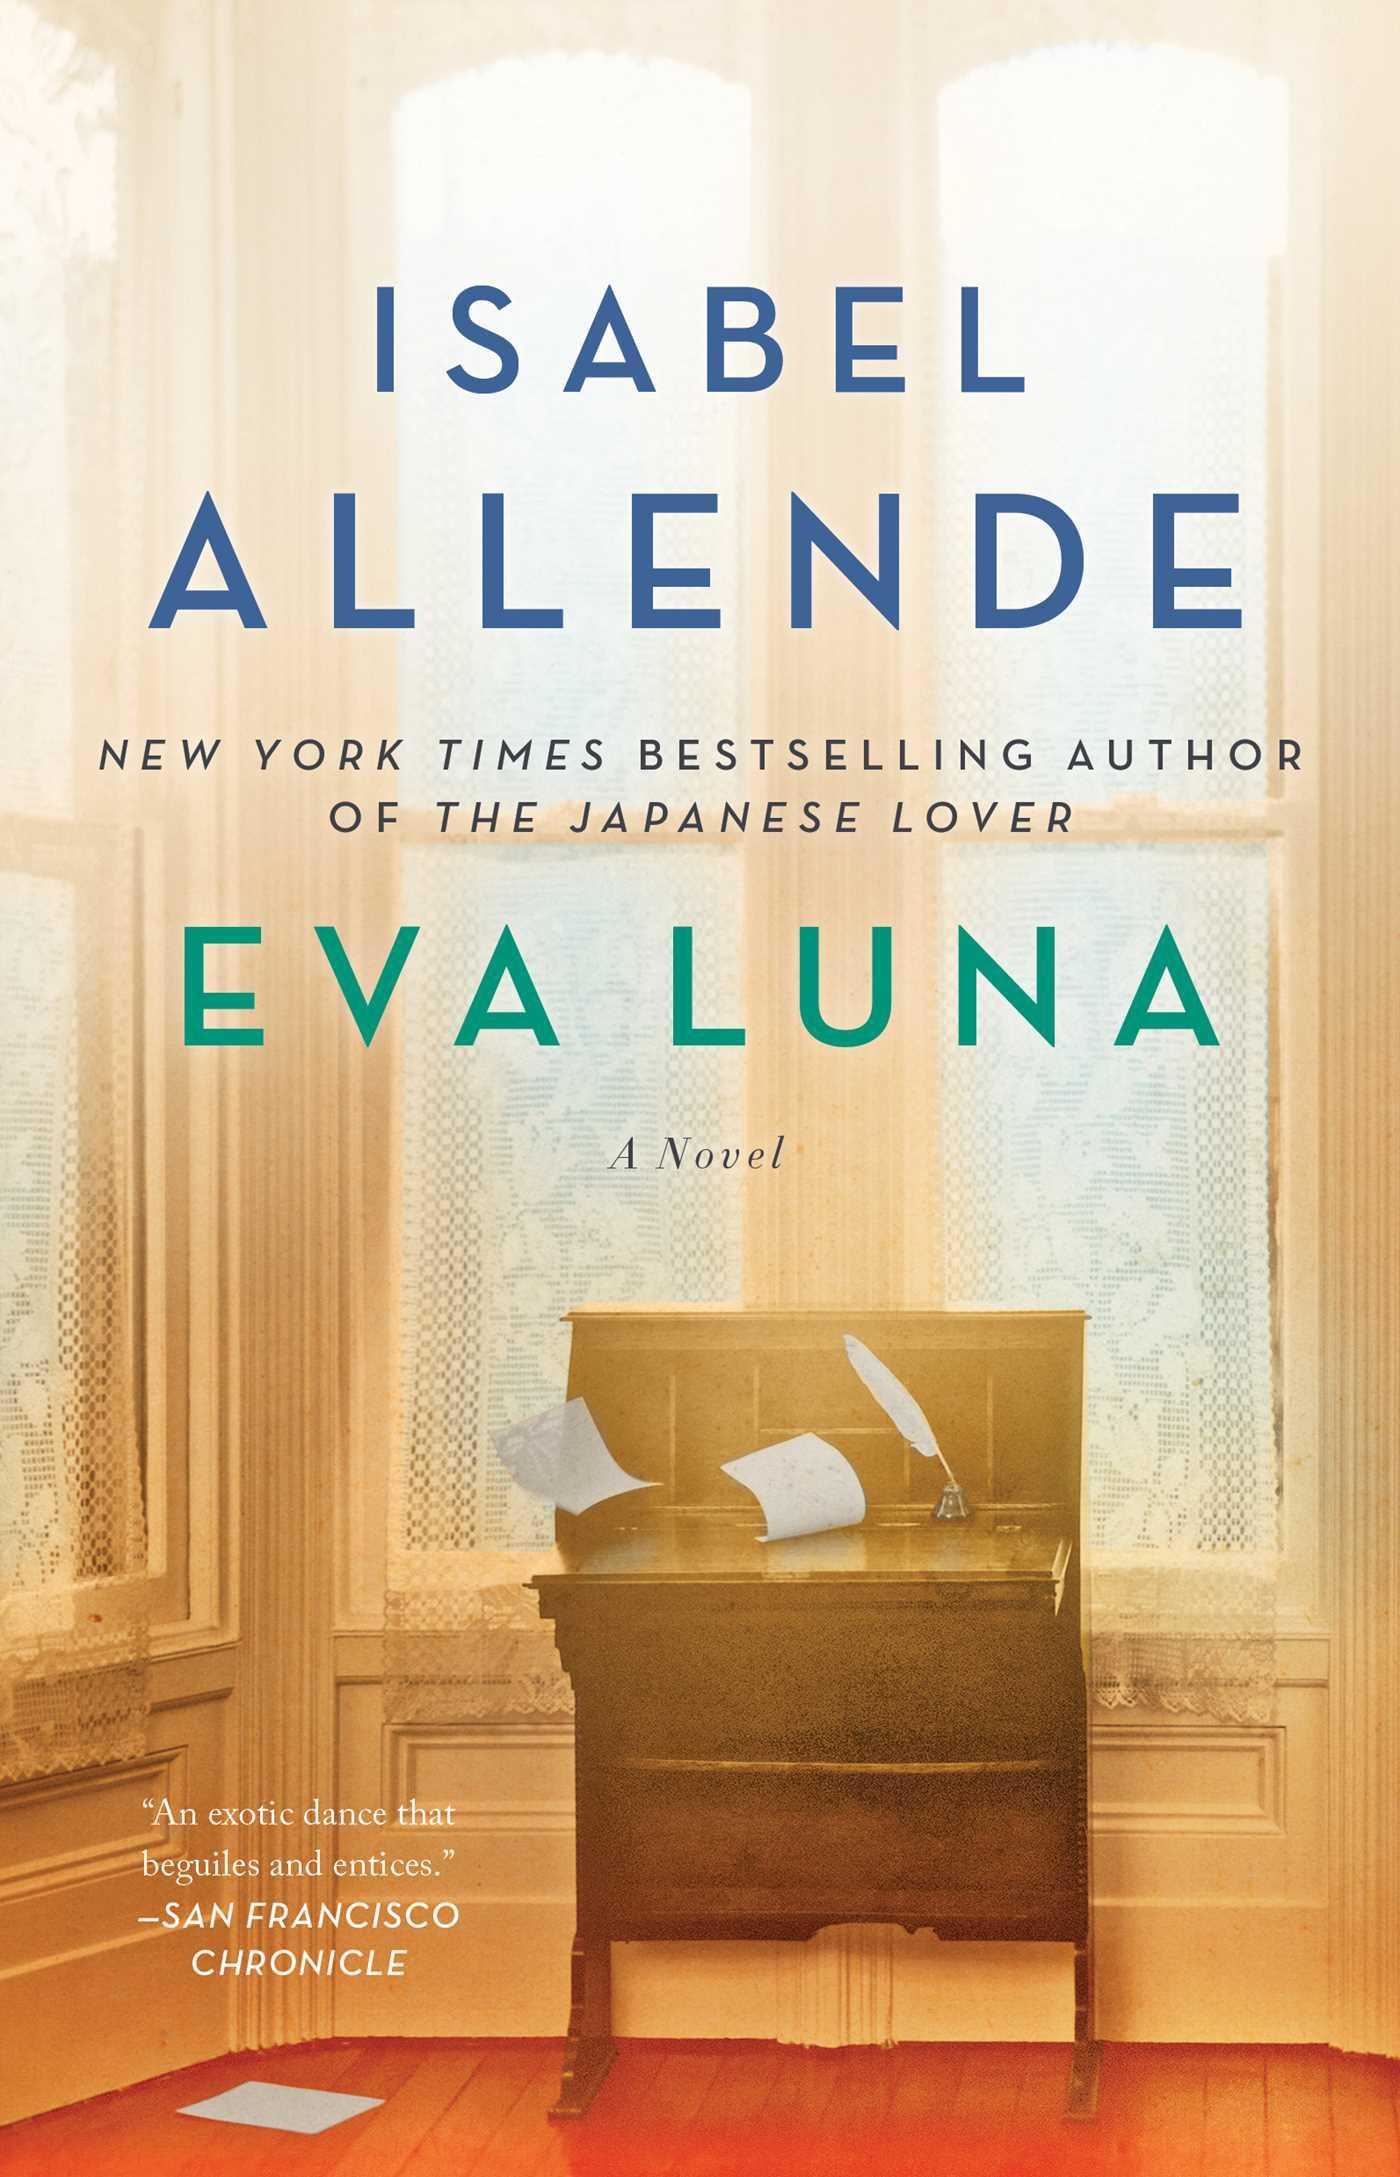 Eva Luna | Book by Isabel Allende | Official Publisher Page | Simon &  Schuster